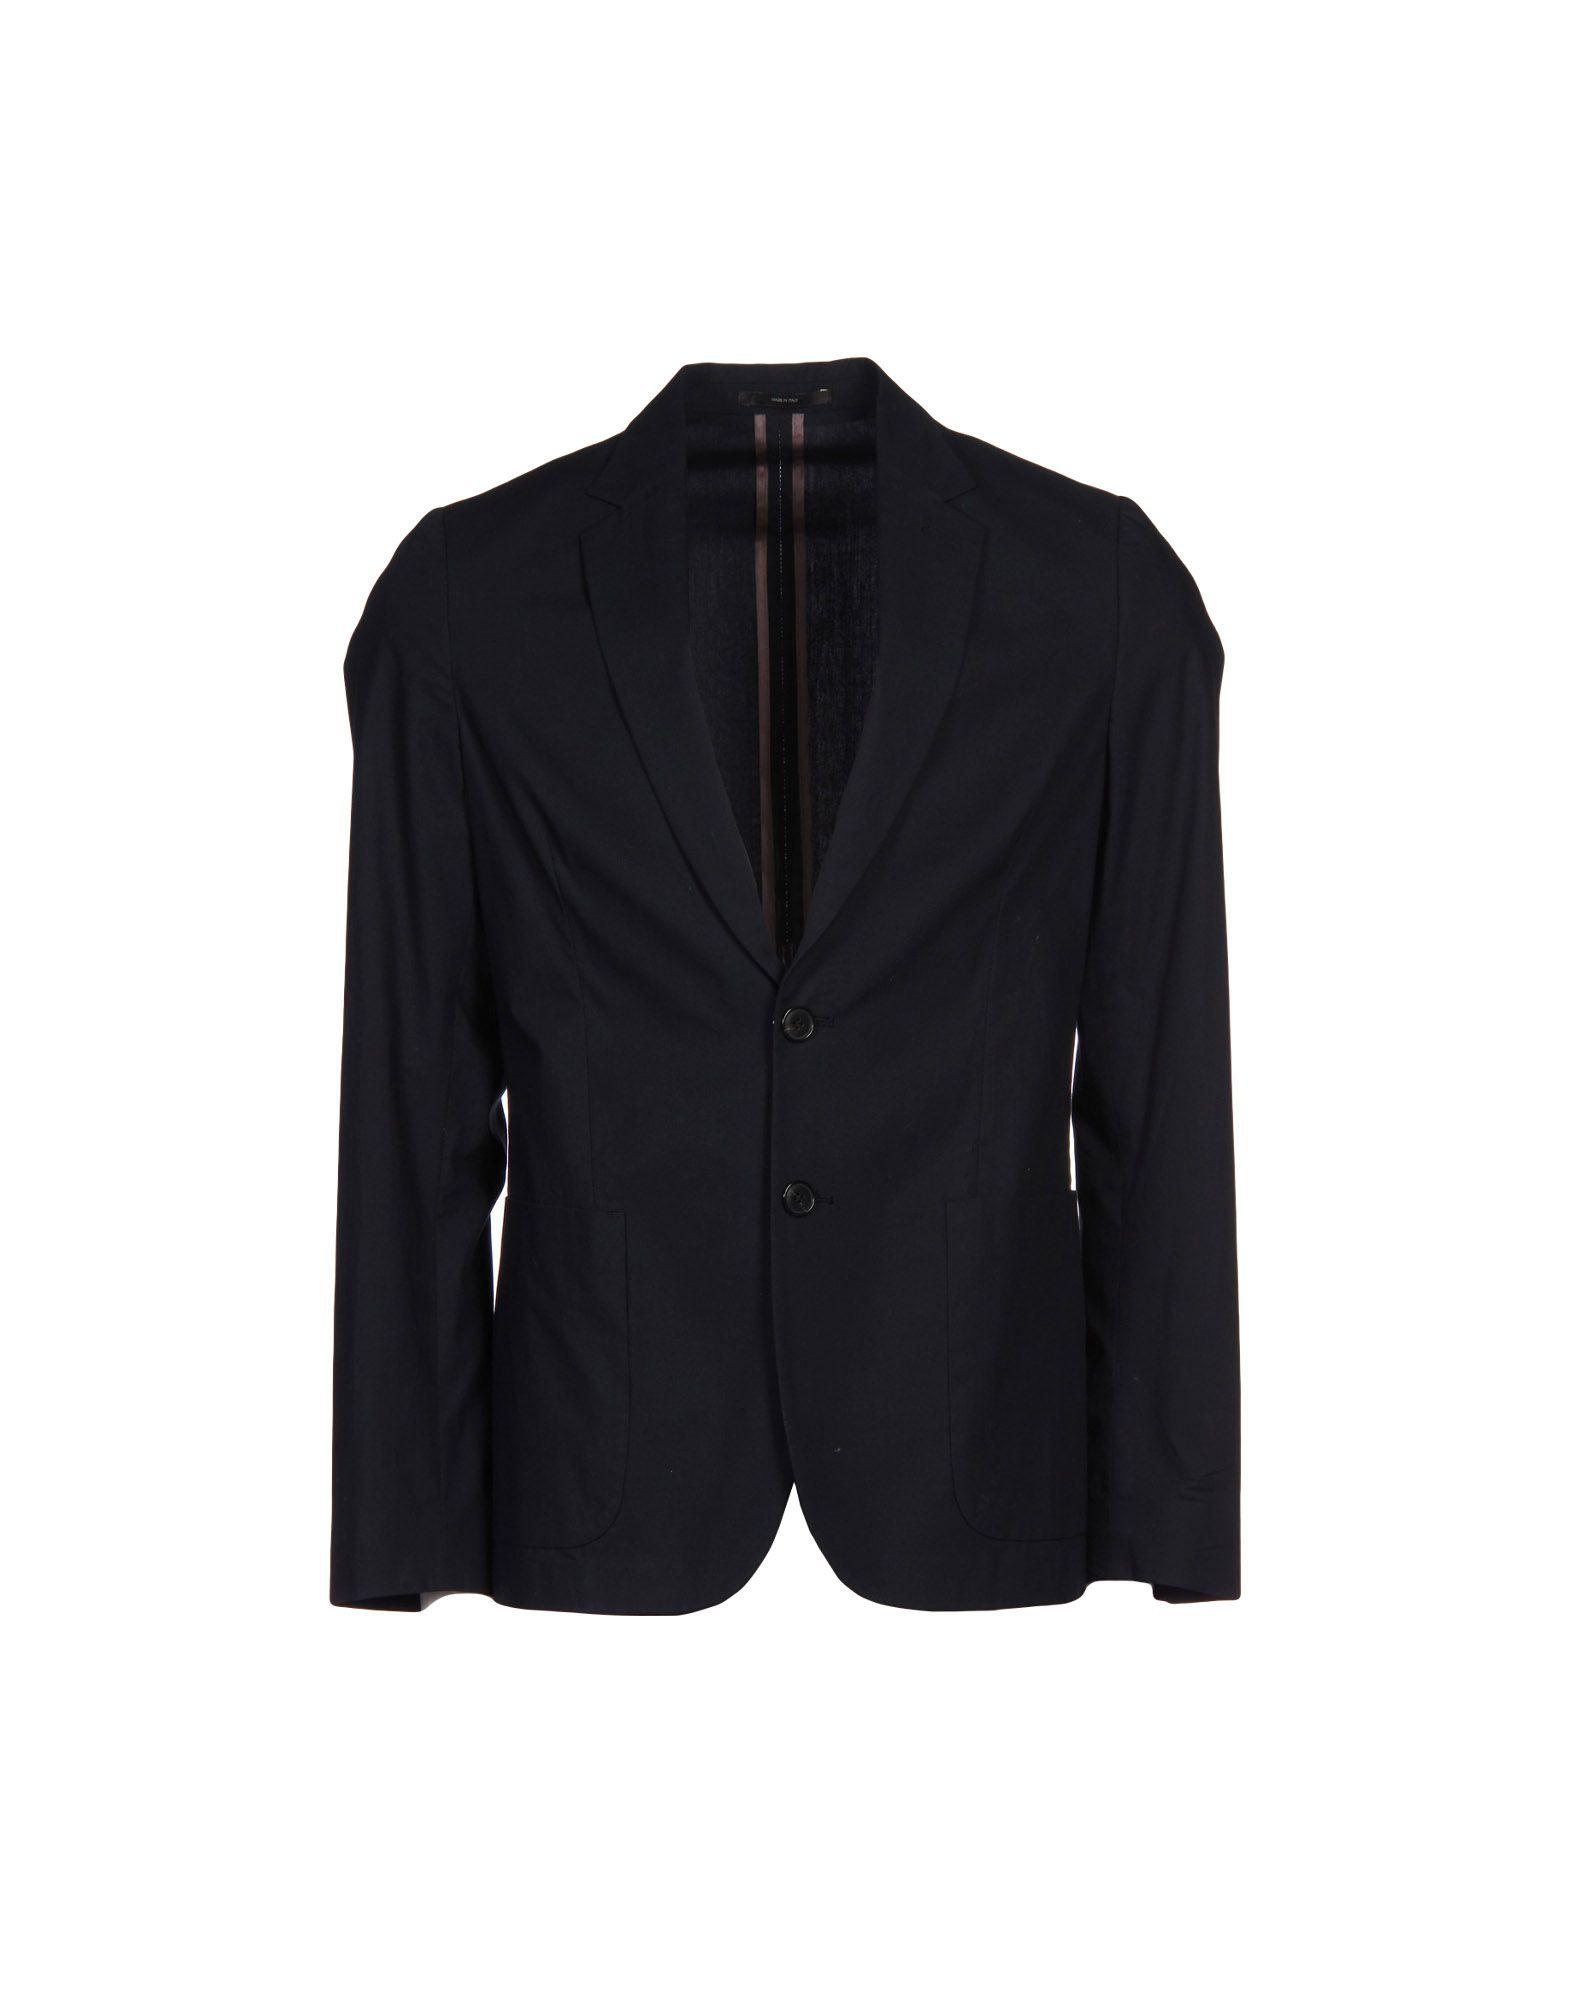 58ad8ab305bf Best men s fashion shop - Online shopping website for men - Cools.com